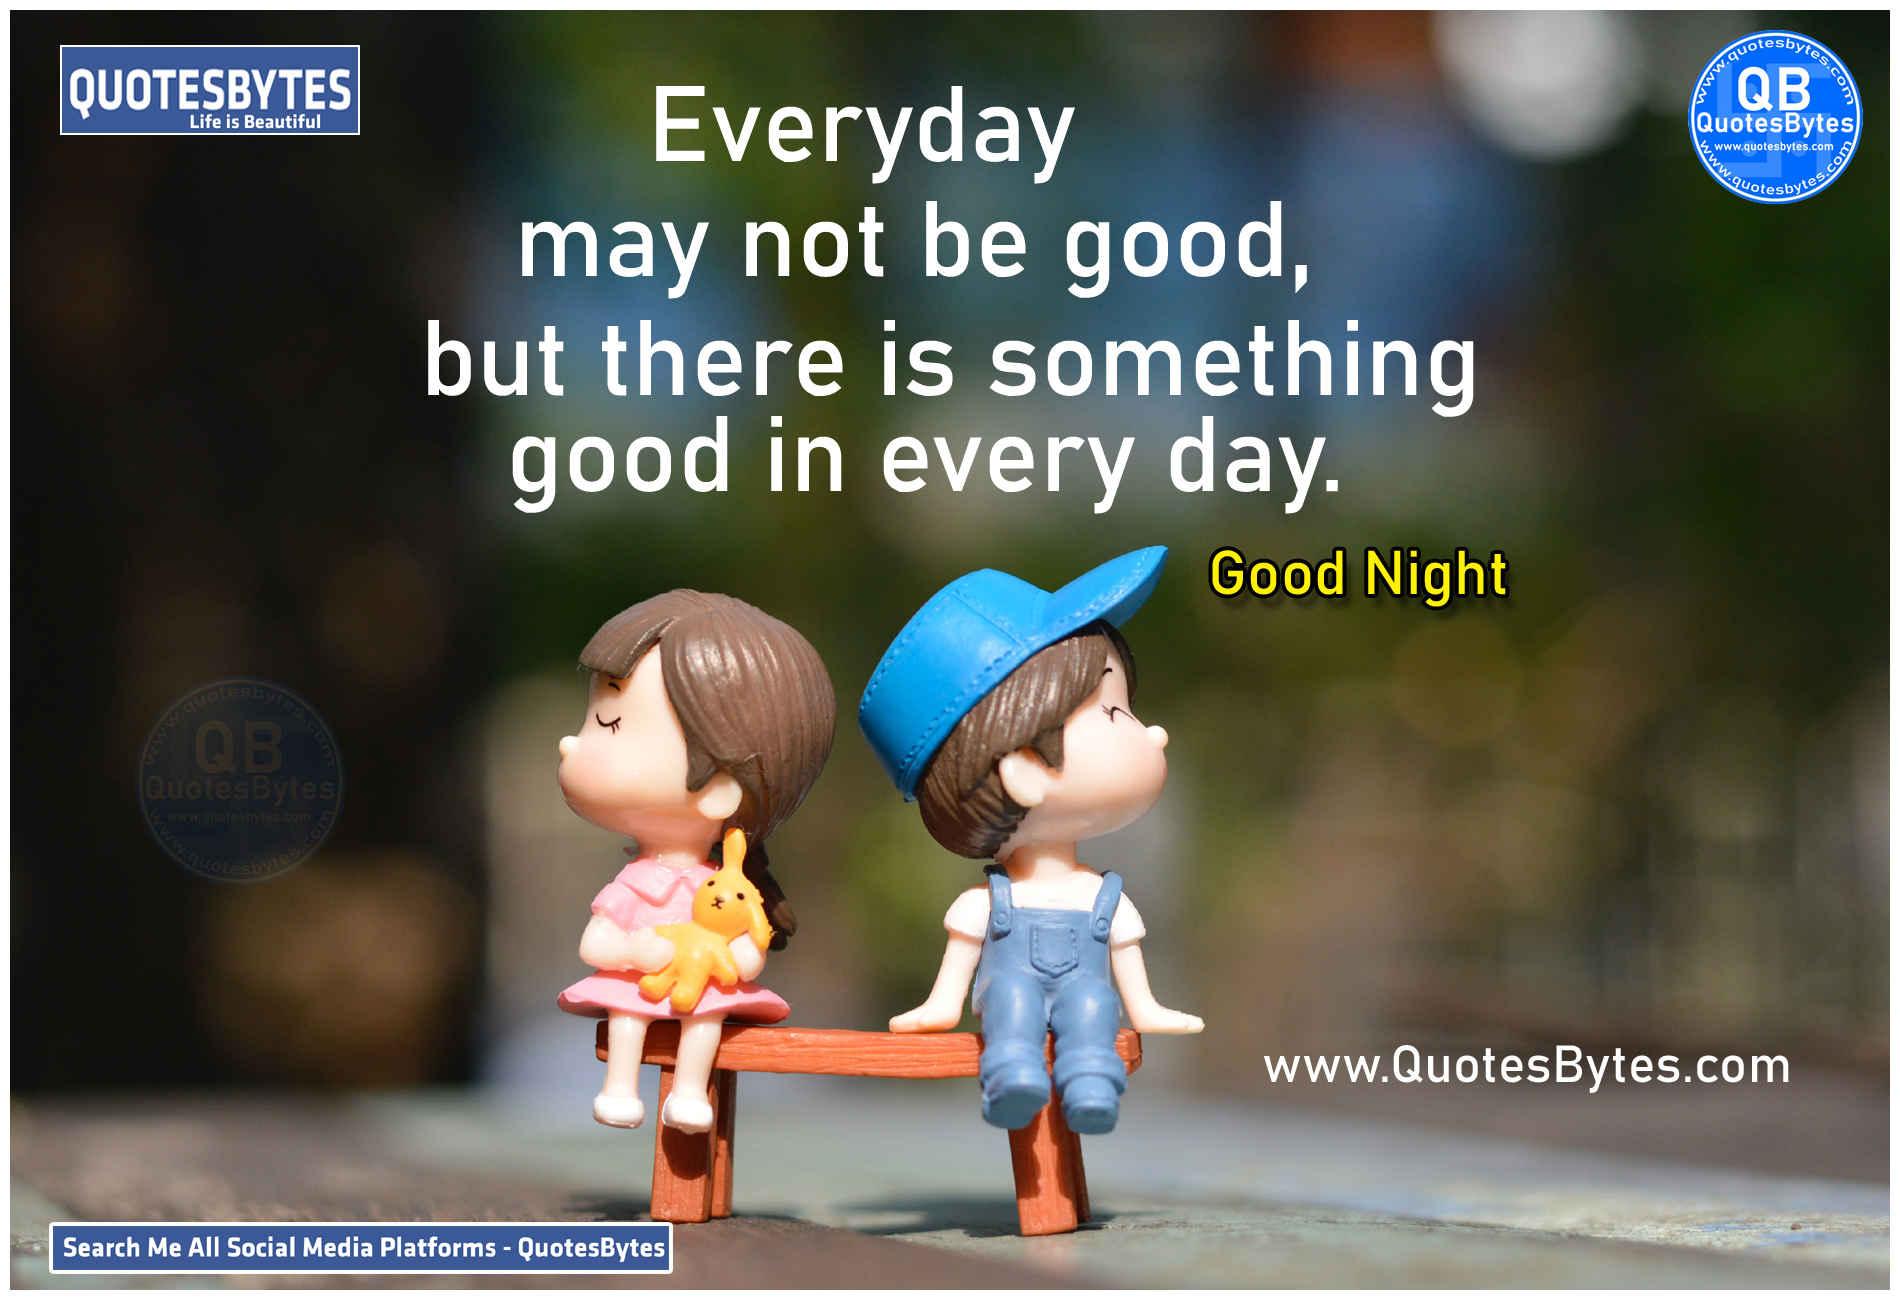 Good Night in English,Good Night Quotes in English,GOODNIGHT: QUOTES, IMAGES, SMS, WHATSAPP STATUS, WISHES, GREETINGS IN ENGLISH,GoodNight Quotes English,GoodNight Quotes in English With Images,English Good NightGreetings,English Good NightQuotes,GoodNight Quote In English,Best Good Night Quotes in English with Images for 2021,Good Night Quotes Inspirational In English,English Good Night Inspirational Quotes-Messages On Life In English,GoodNightEnglish Images with Quotes,Heart touching good Night quotes in English,GoodNight Quotes In English,English New good Night quotes and Wishes 2021,Good Night Wishes in English,Beautiful Good Night quotes in English ,Good Night Quotes With Images,GoodNight Quotes, Wishes In English [ Latest 2021 ],English Inspirational Good NightQuotes,GoodNightEnglishQuotes,English Good Night Quotes images,English inspirational Quotes images, English Good Night quotes in English,GoodNight Inspirational Quotes English,goodNightkavithalu images in English,Best Good Night Quotes EnglishImages,latest quotes about good Nightquotes,Best Good Night Quotes and Wishes,latest quotes in English,Best Good Night Quotes In English - Day Wishs,latest quotes for inspirational quotes in English,GoodNight Quotes Status SMS,topEnglish good Night quotes in English,GoodNight Quotes Inspirational In English,latestkavithalu image in English,Fresh Good Night Messages In English,Good Night English,good night images,good night quotes,funny good night .